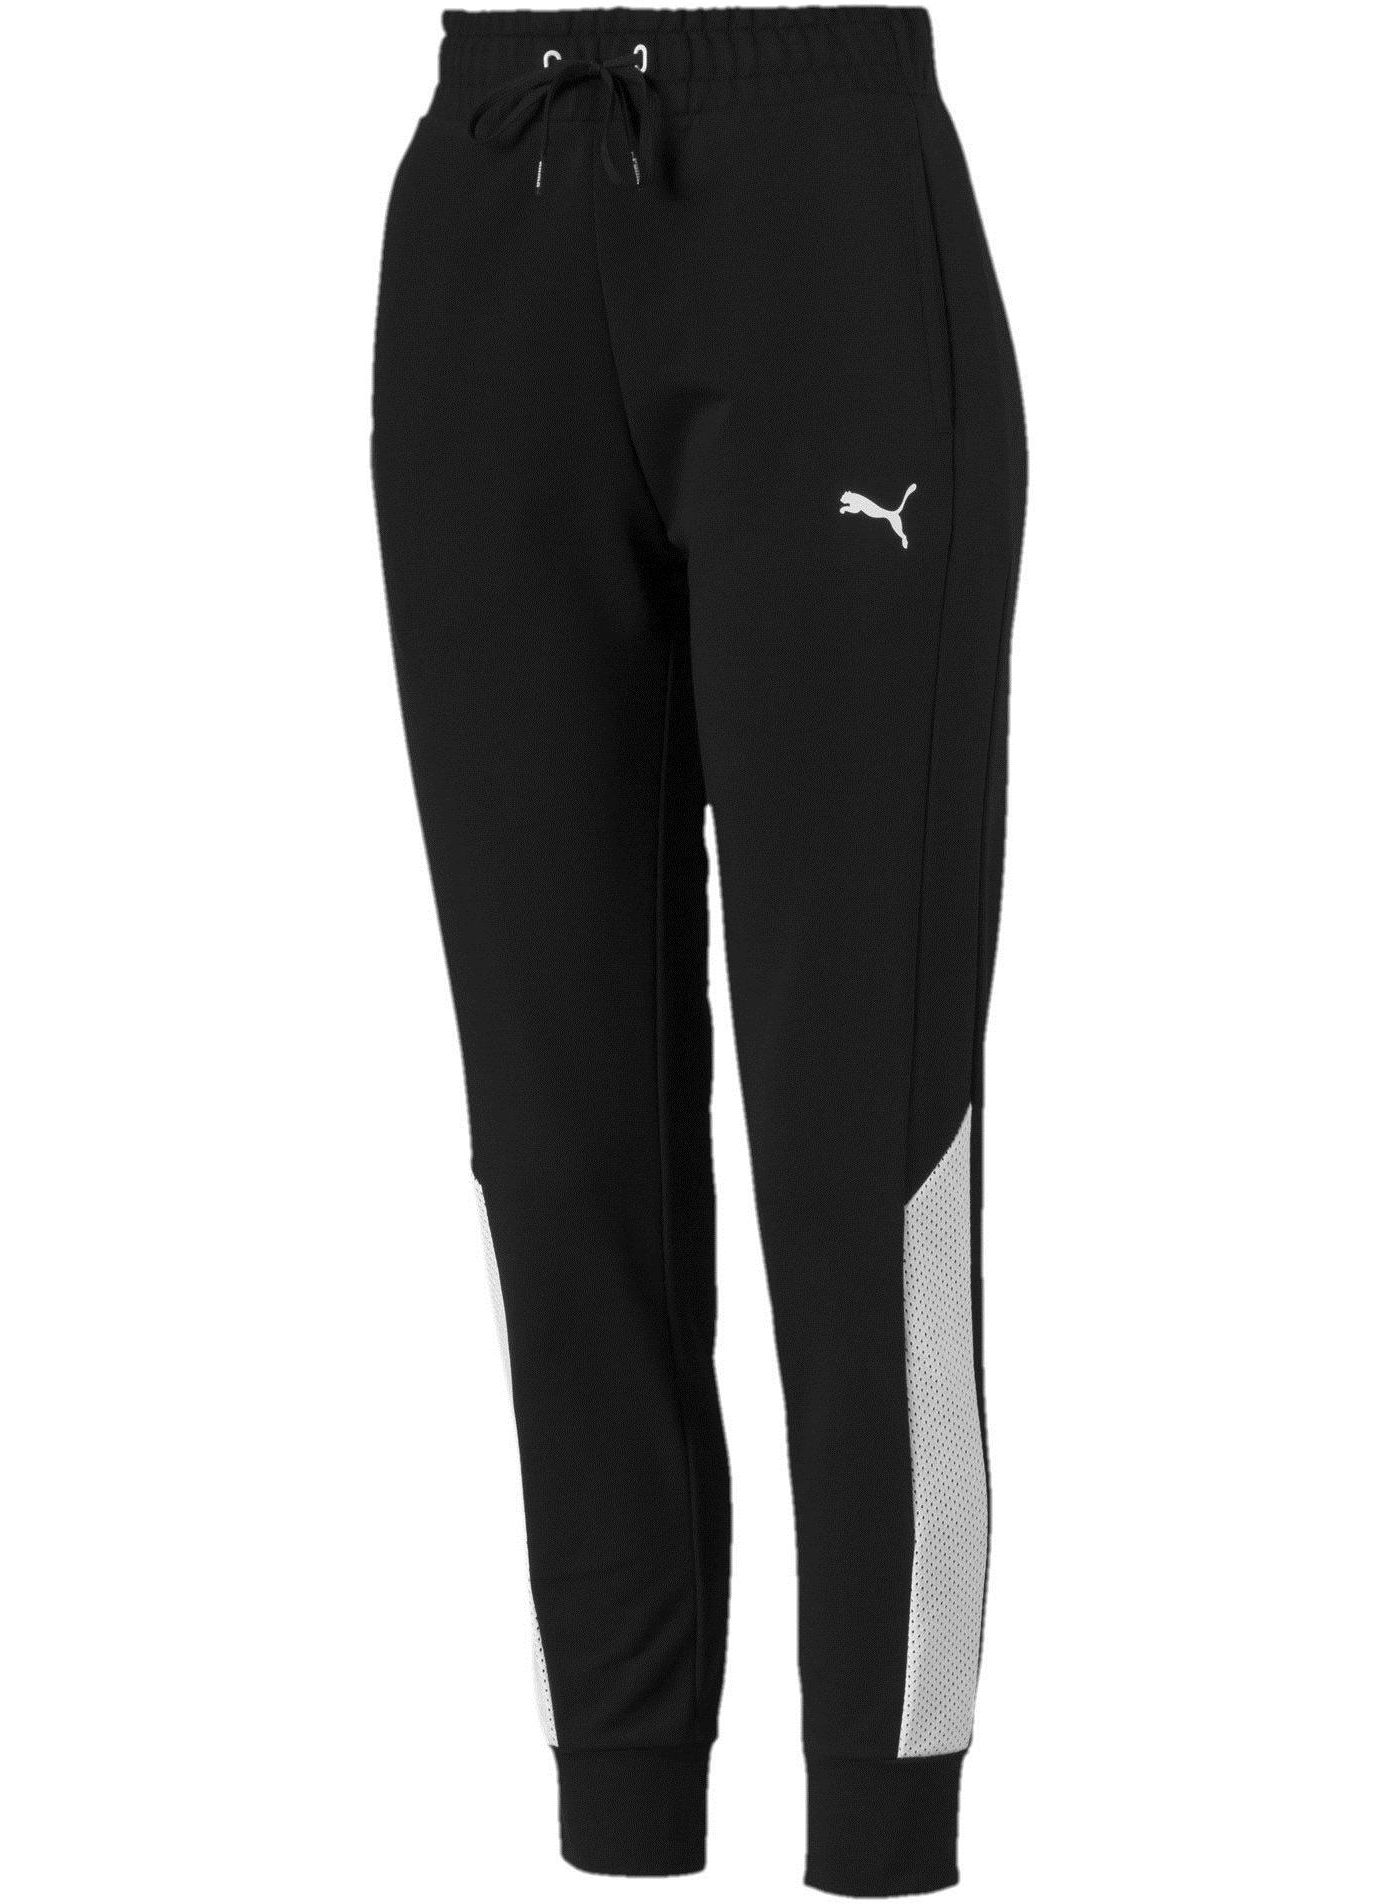 PUMA Women's Modern Sports Pants